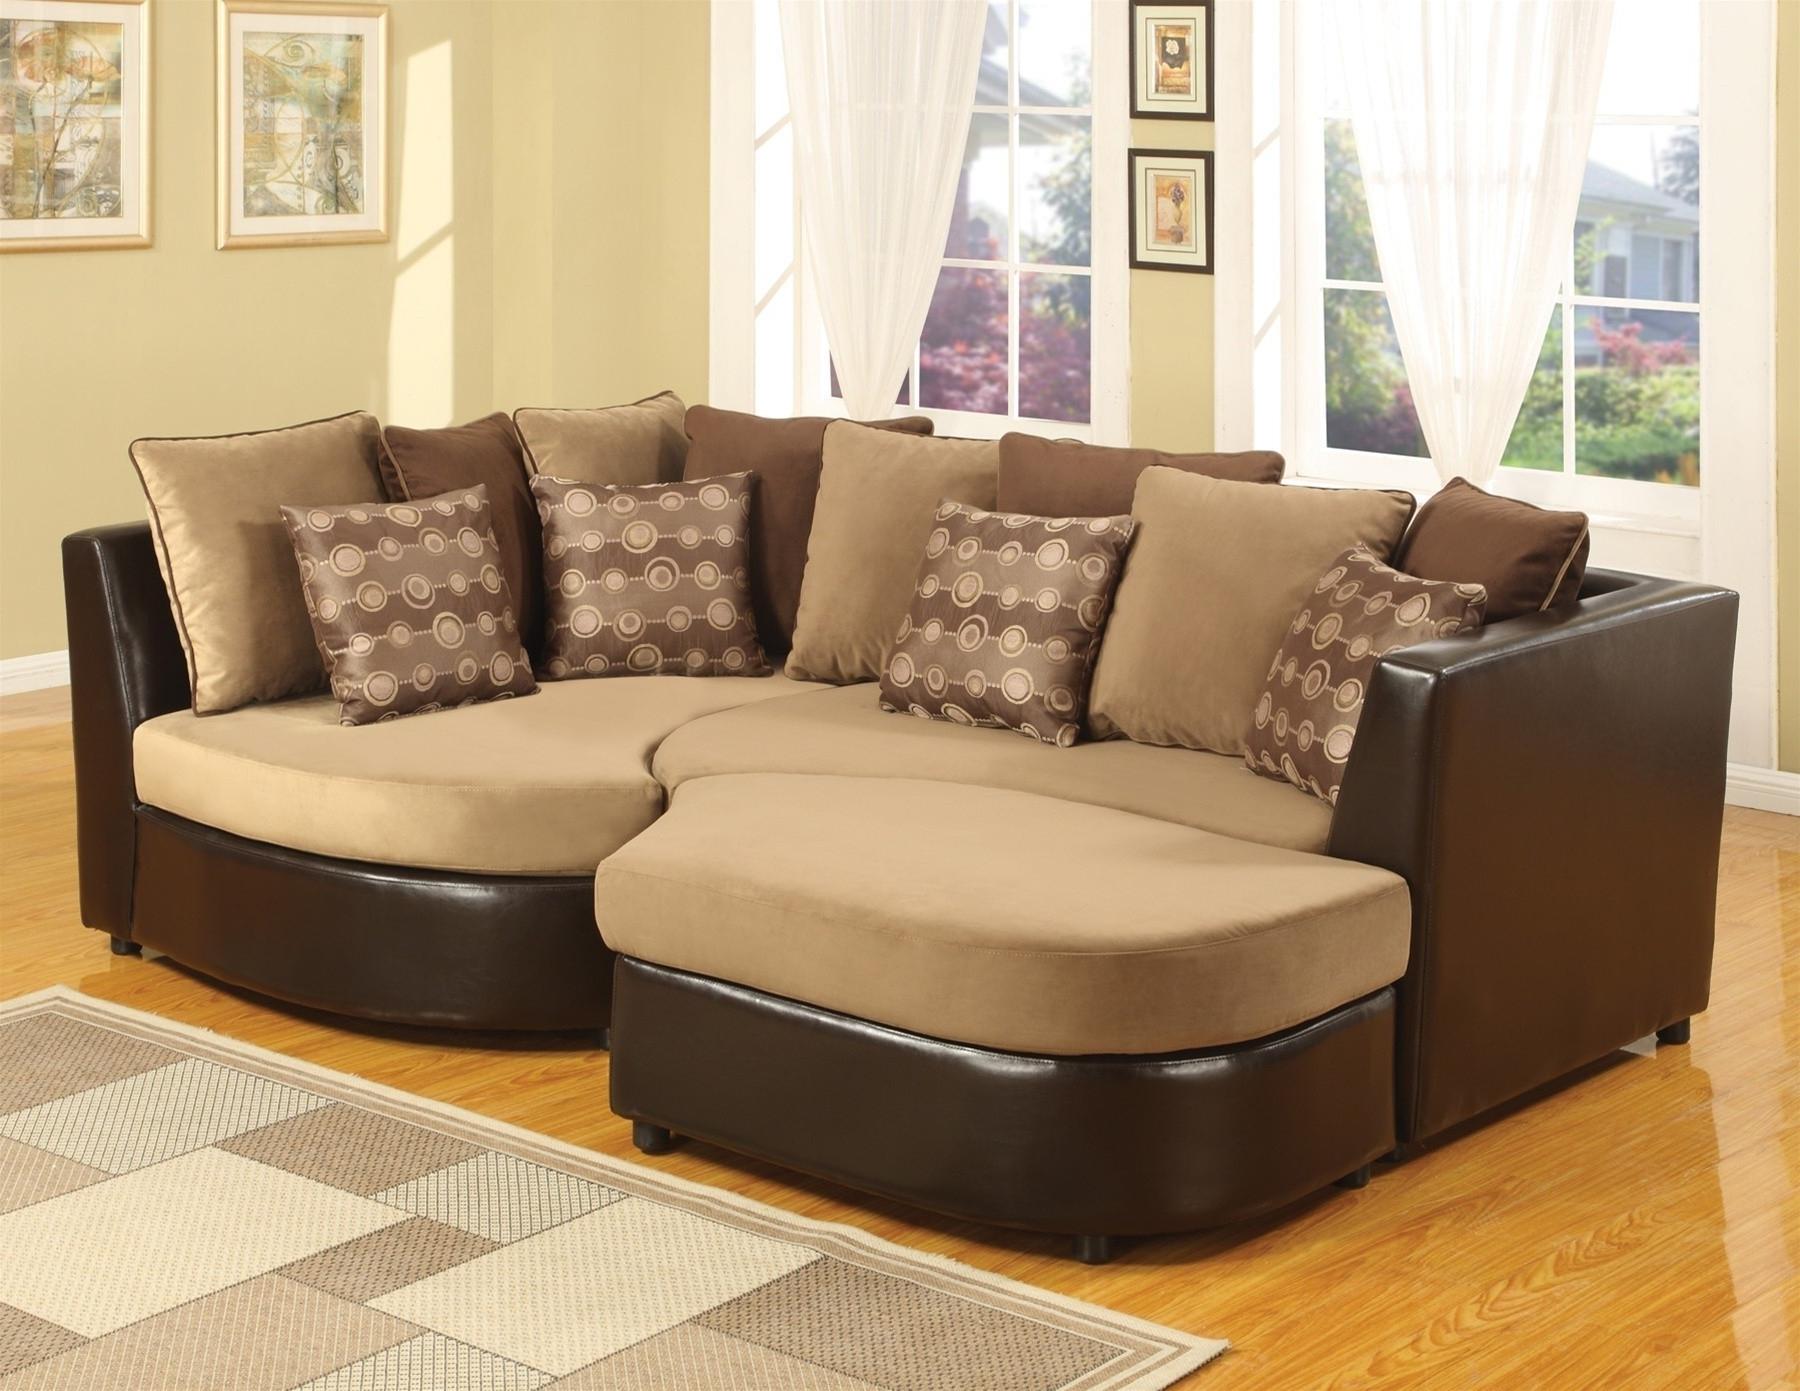 Trendy Sofas With Oversized Pillows Regarding Free Oversized Sofas In Oversized Couch Comfy Sectional Sofas Deep (View 14 of 20)